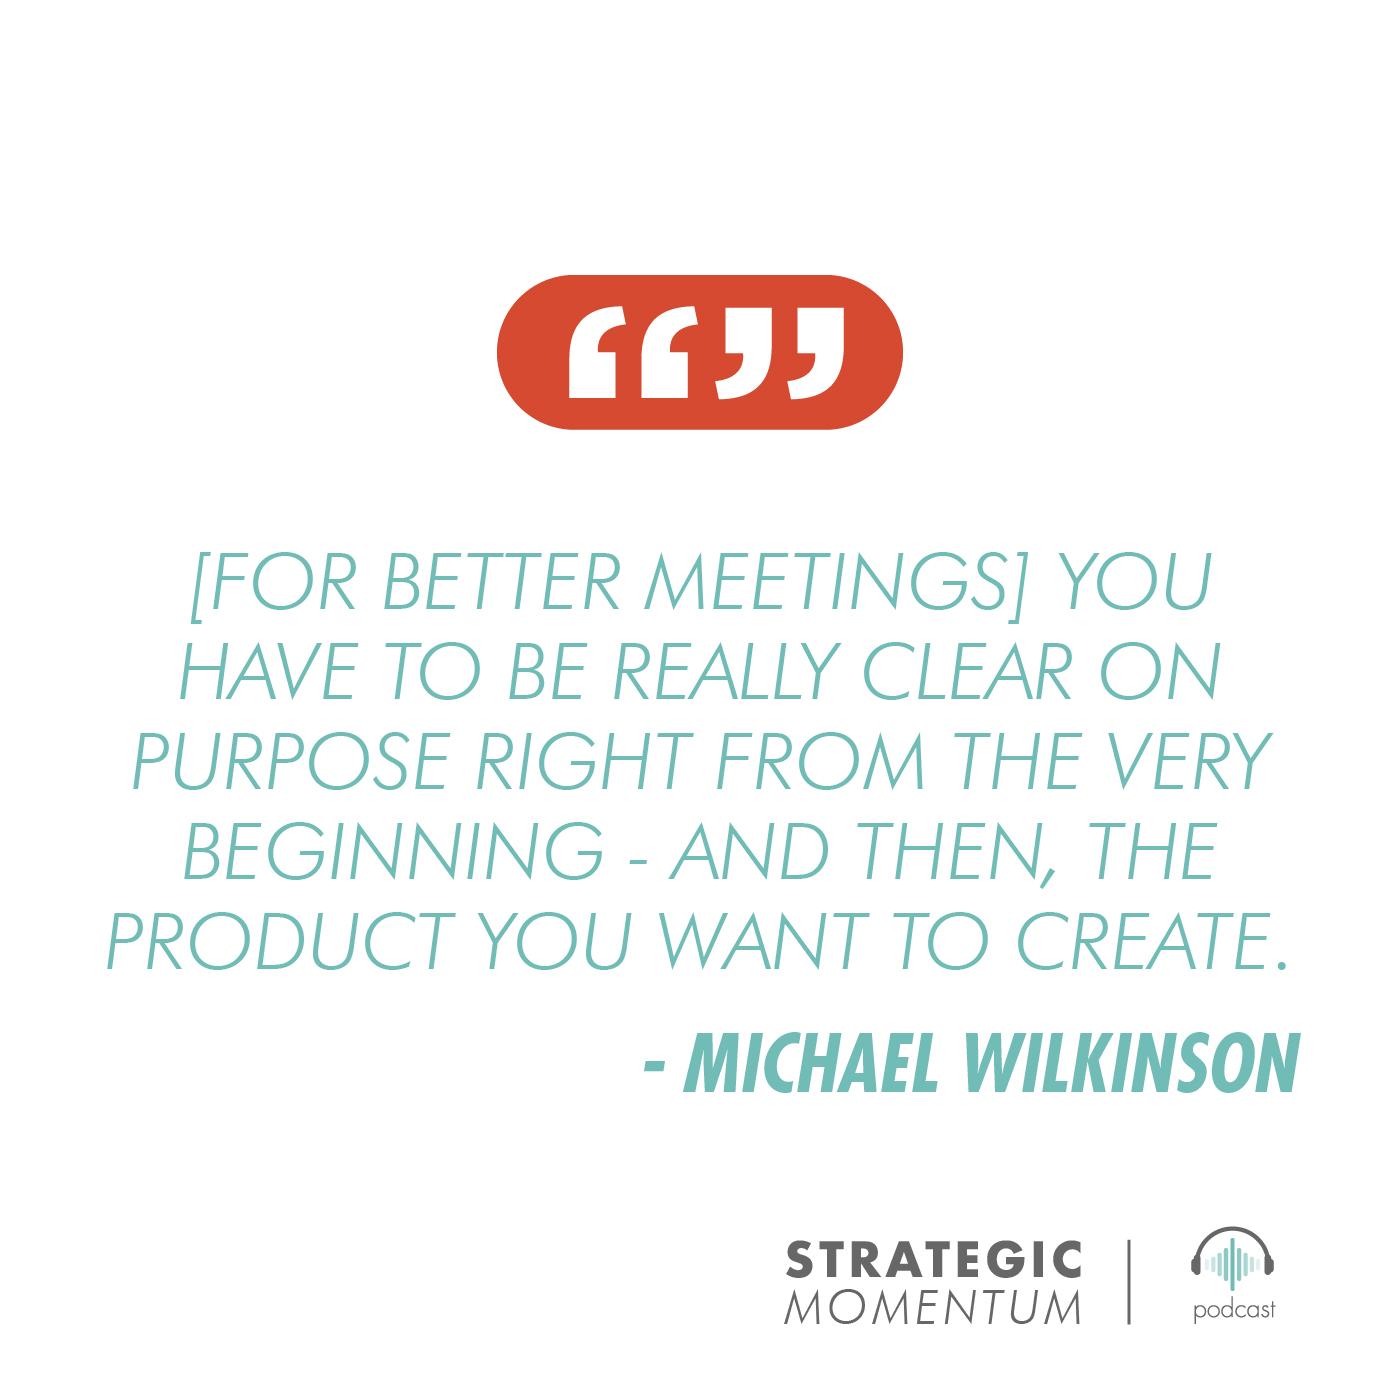 Art - Strategic Momentum 45 - Connie Steele - Michael Wilkinson_Quote 5 - Tile - .jpg